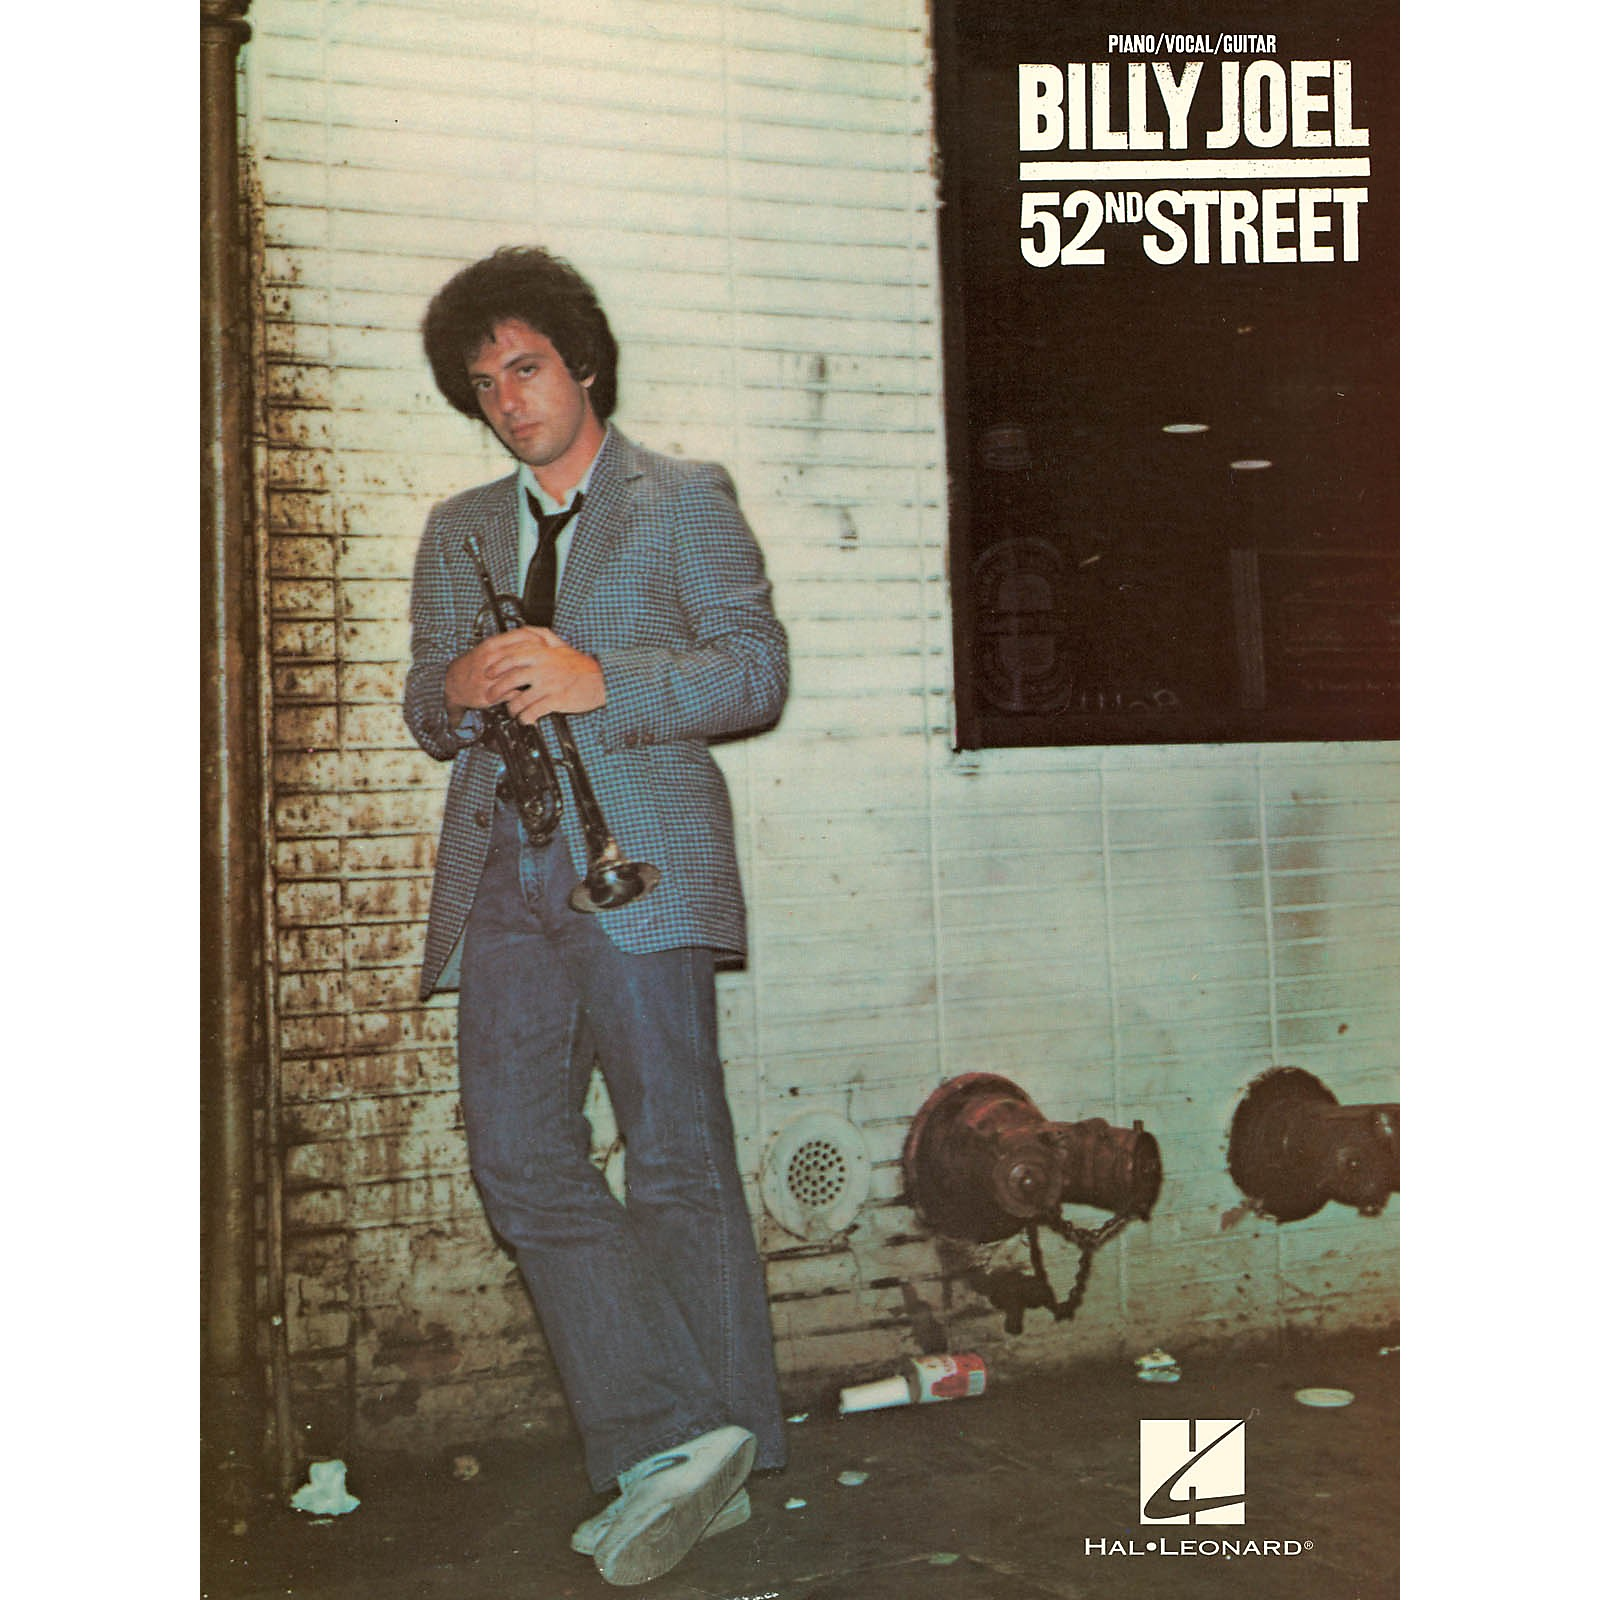 Hal Leonard Billy Joel - 52nd Street Piano/Vocal/Guitar Songbook